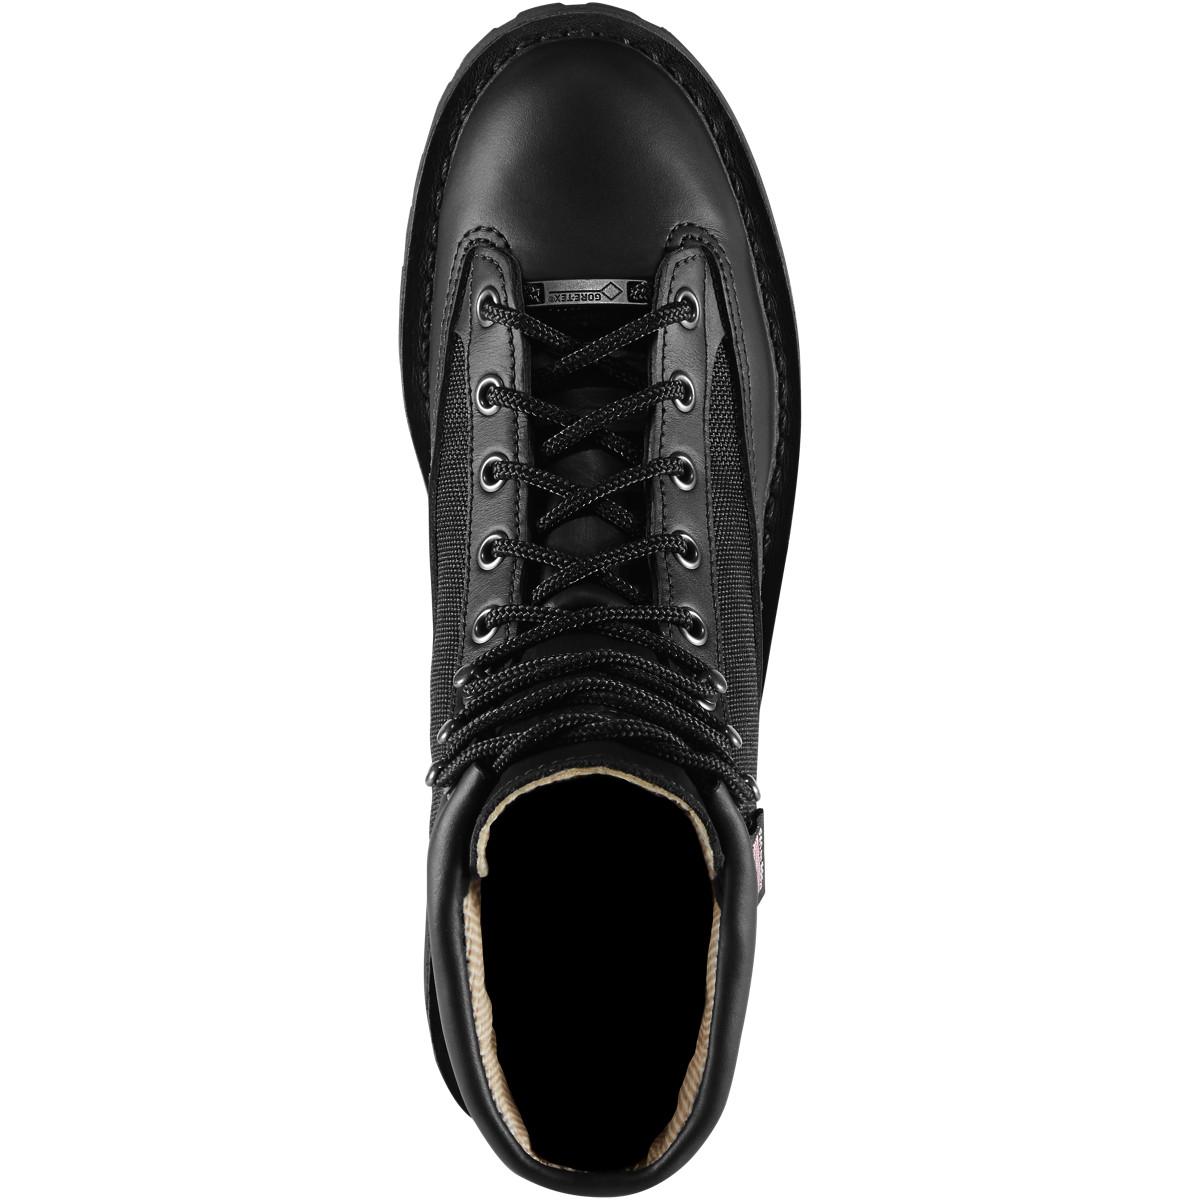 Angelus Leather Shoe Stretcher